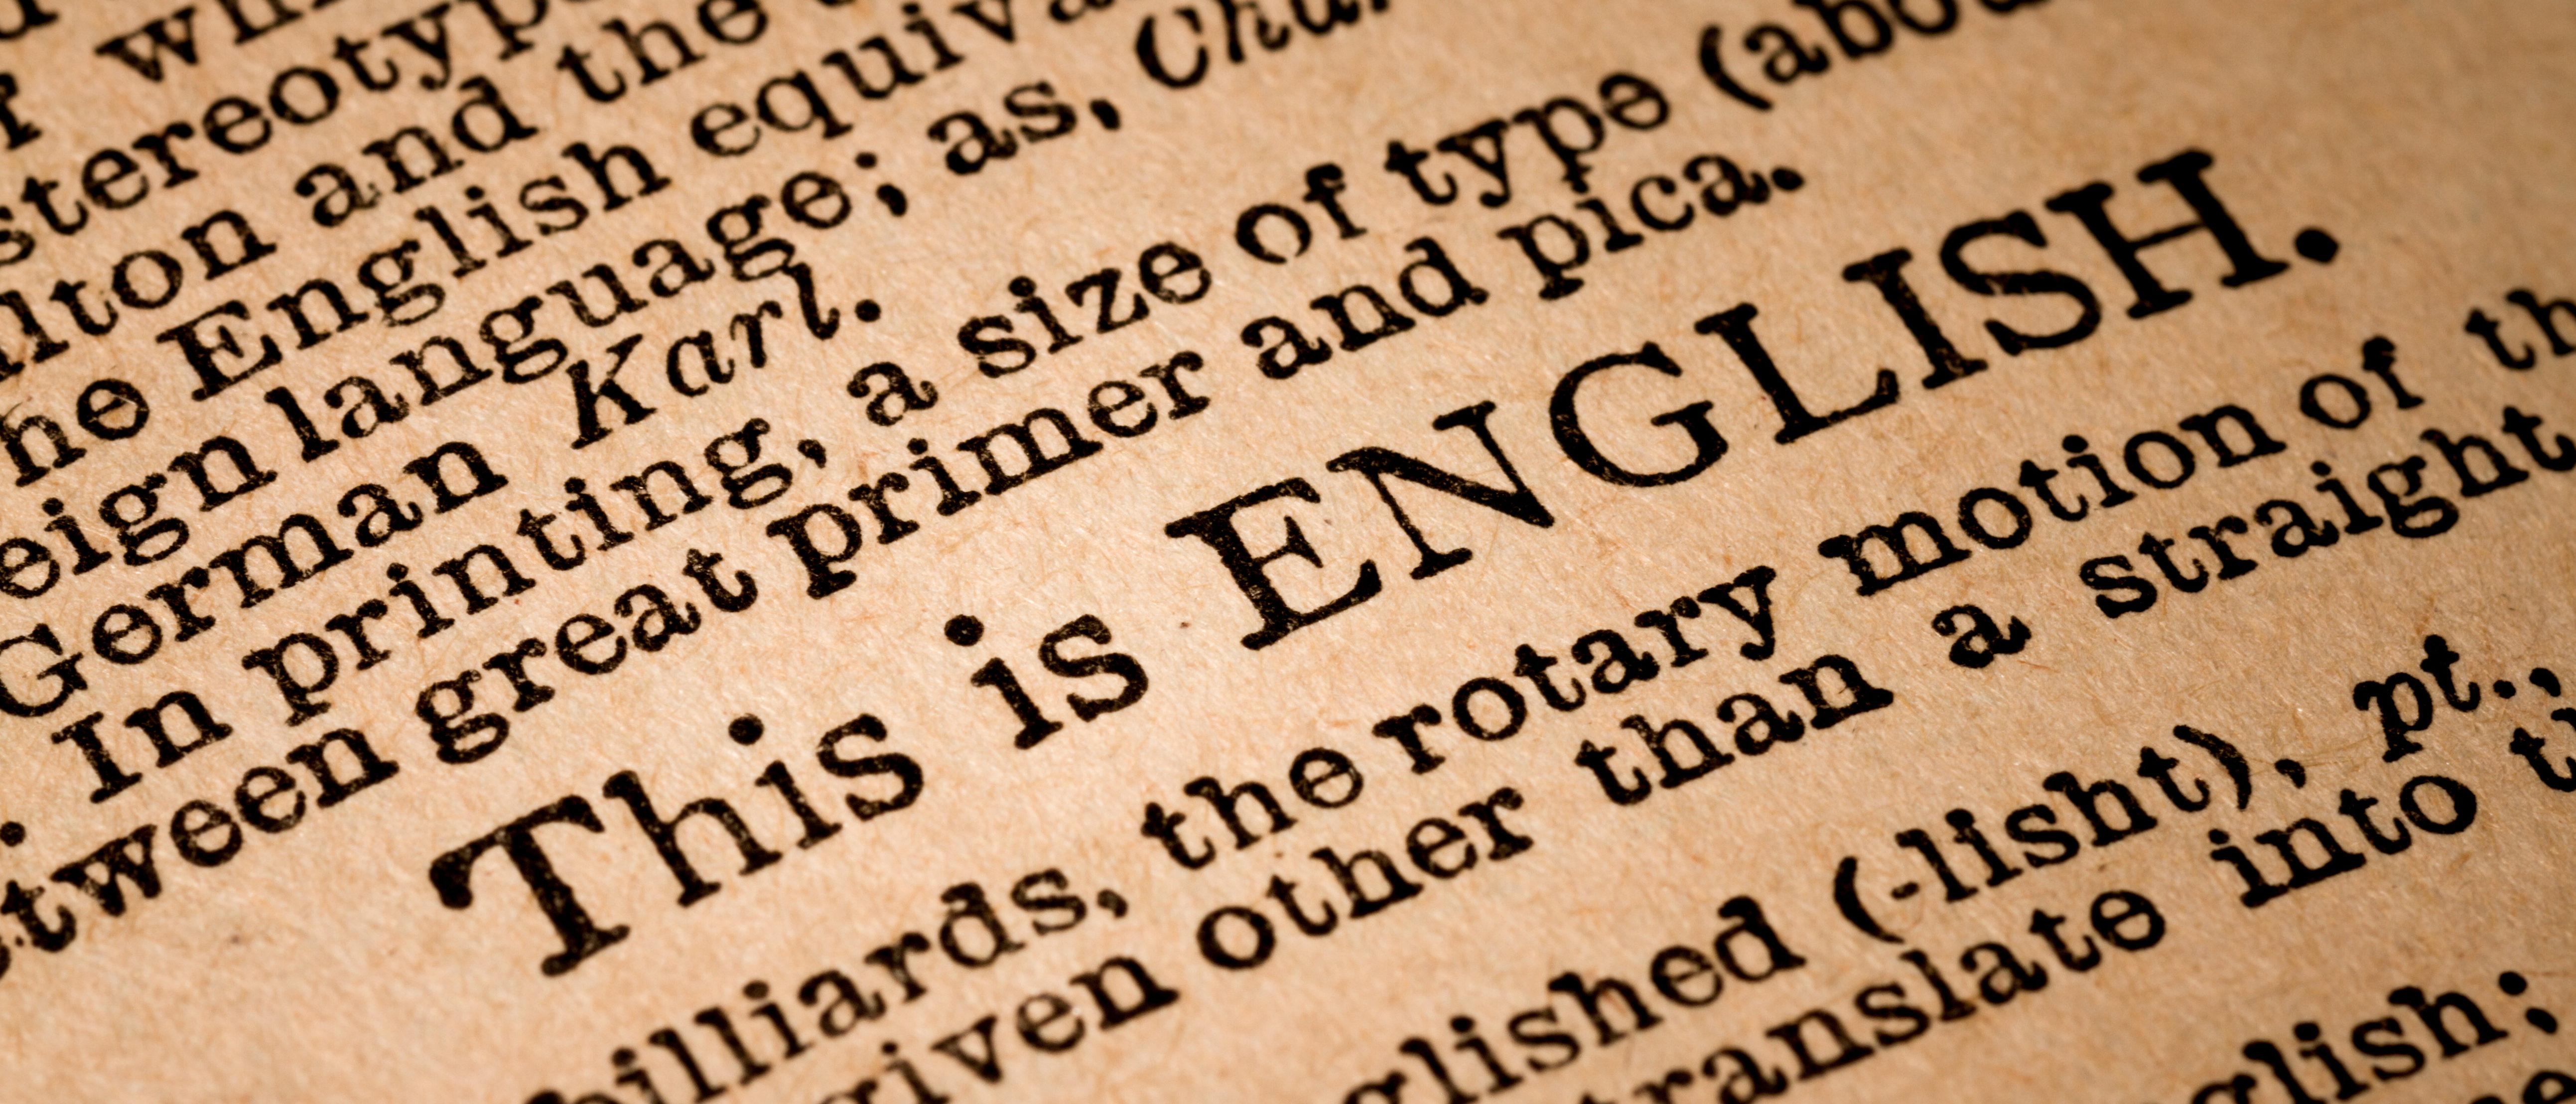 Webster Vintage Dictionary Merriam Adds Slew Millennial Favorites